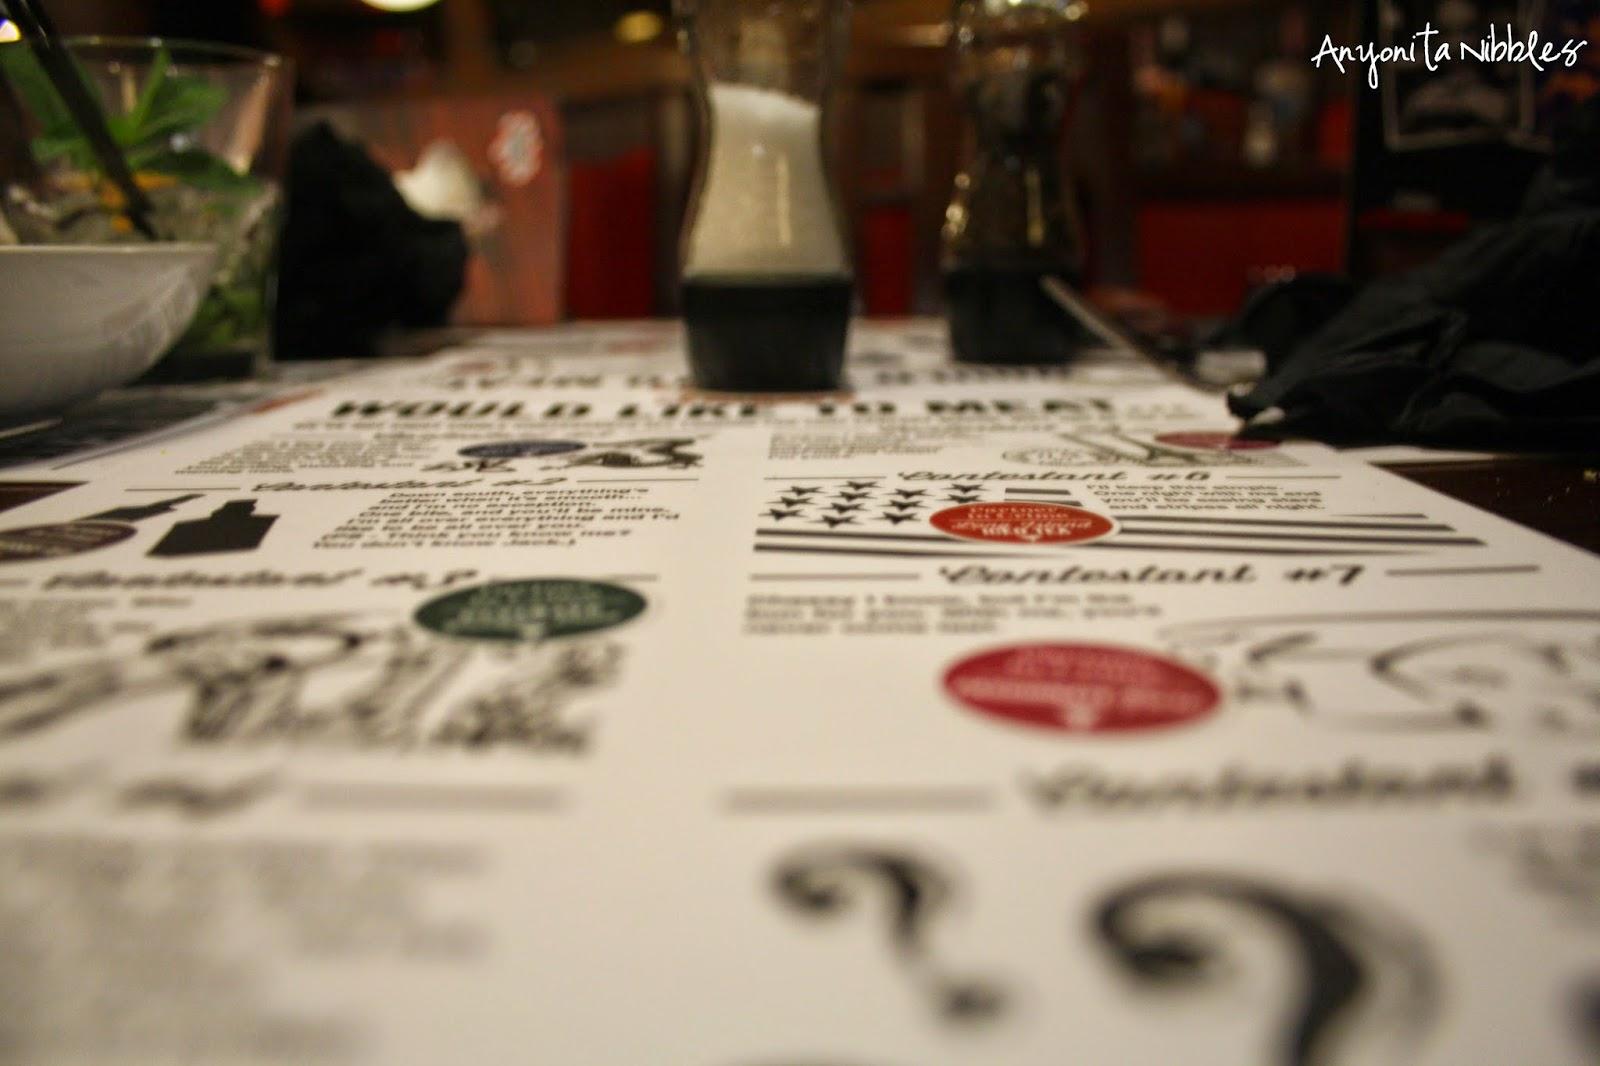 TGI Friday's Burger Blind Date Menu